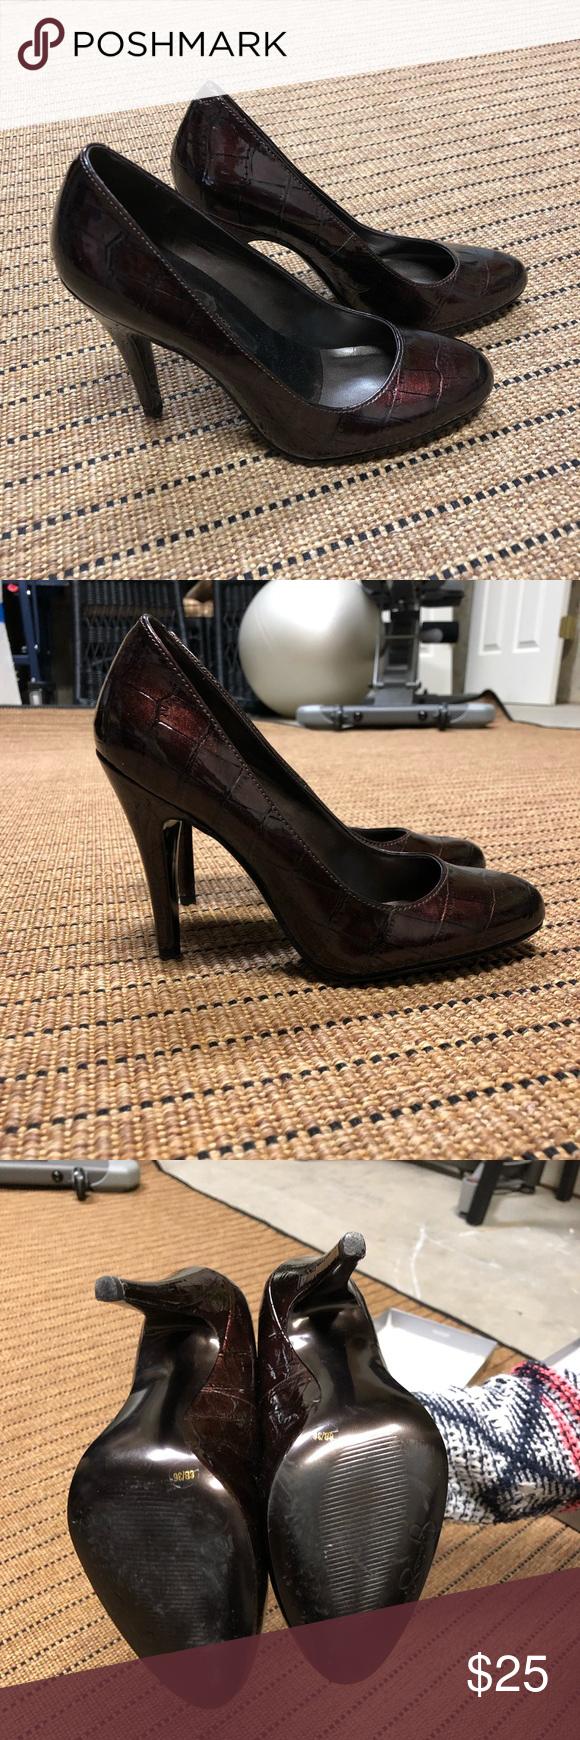 05de0168ceff Worn Once Jessica Simpson Brenda2 Croc Pumps 6 Like New. Deep Burgundy  patent leather pump